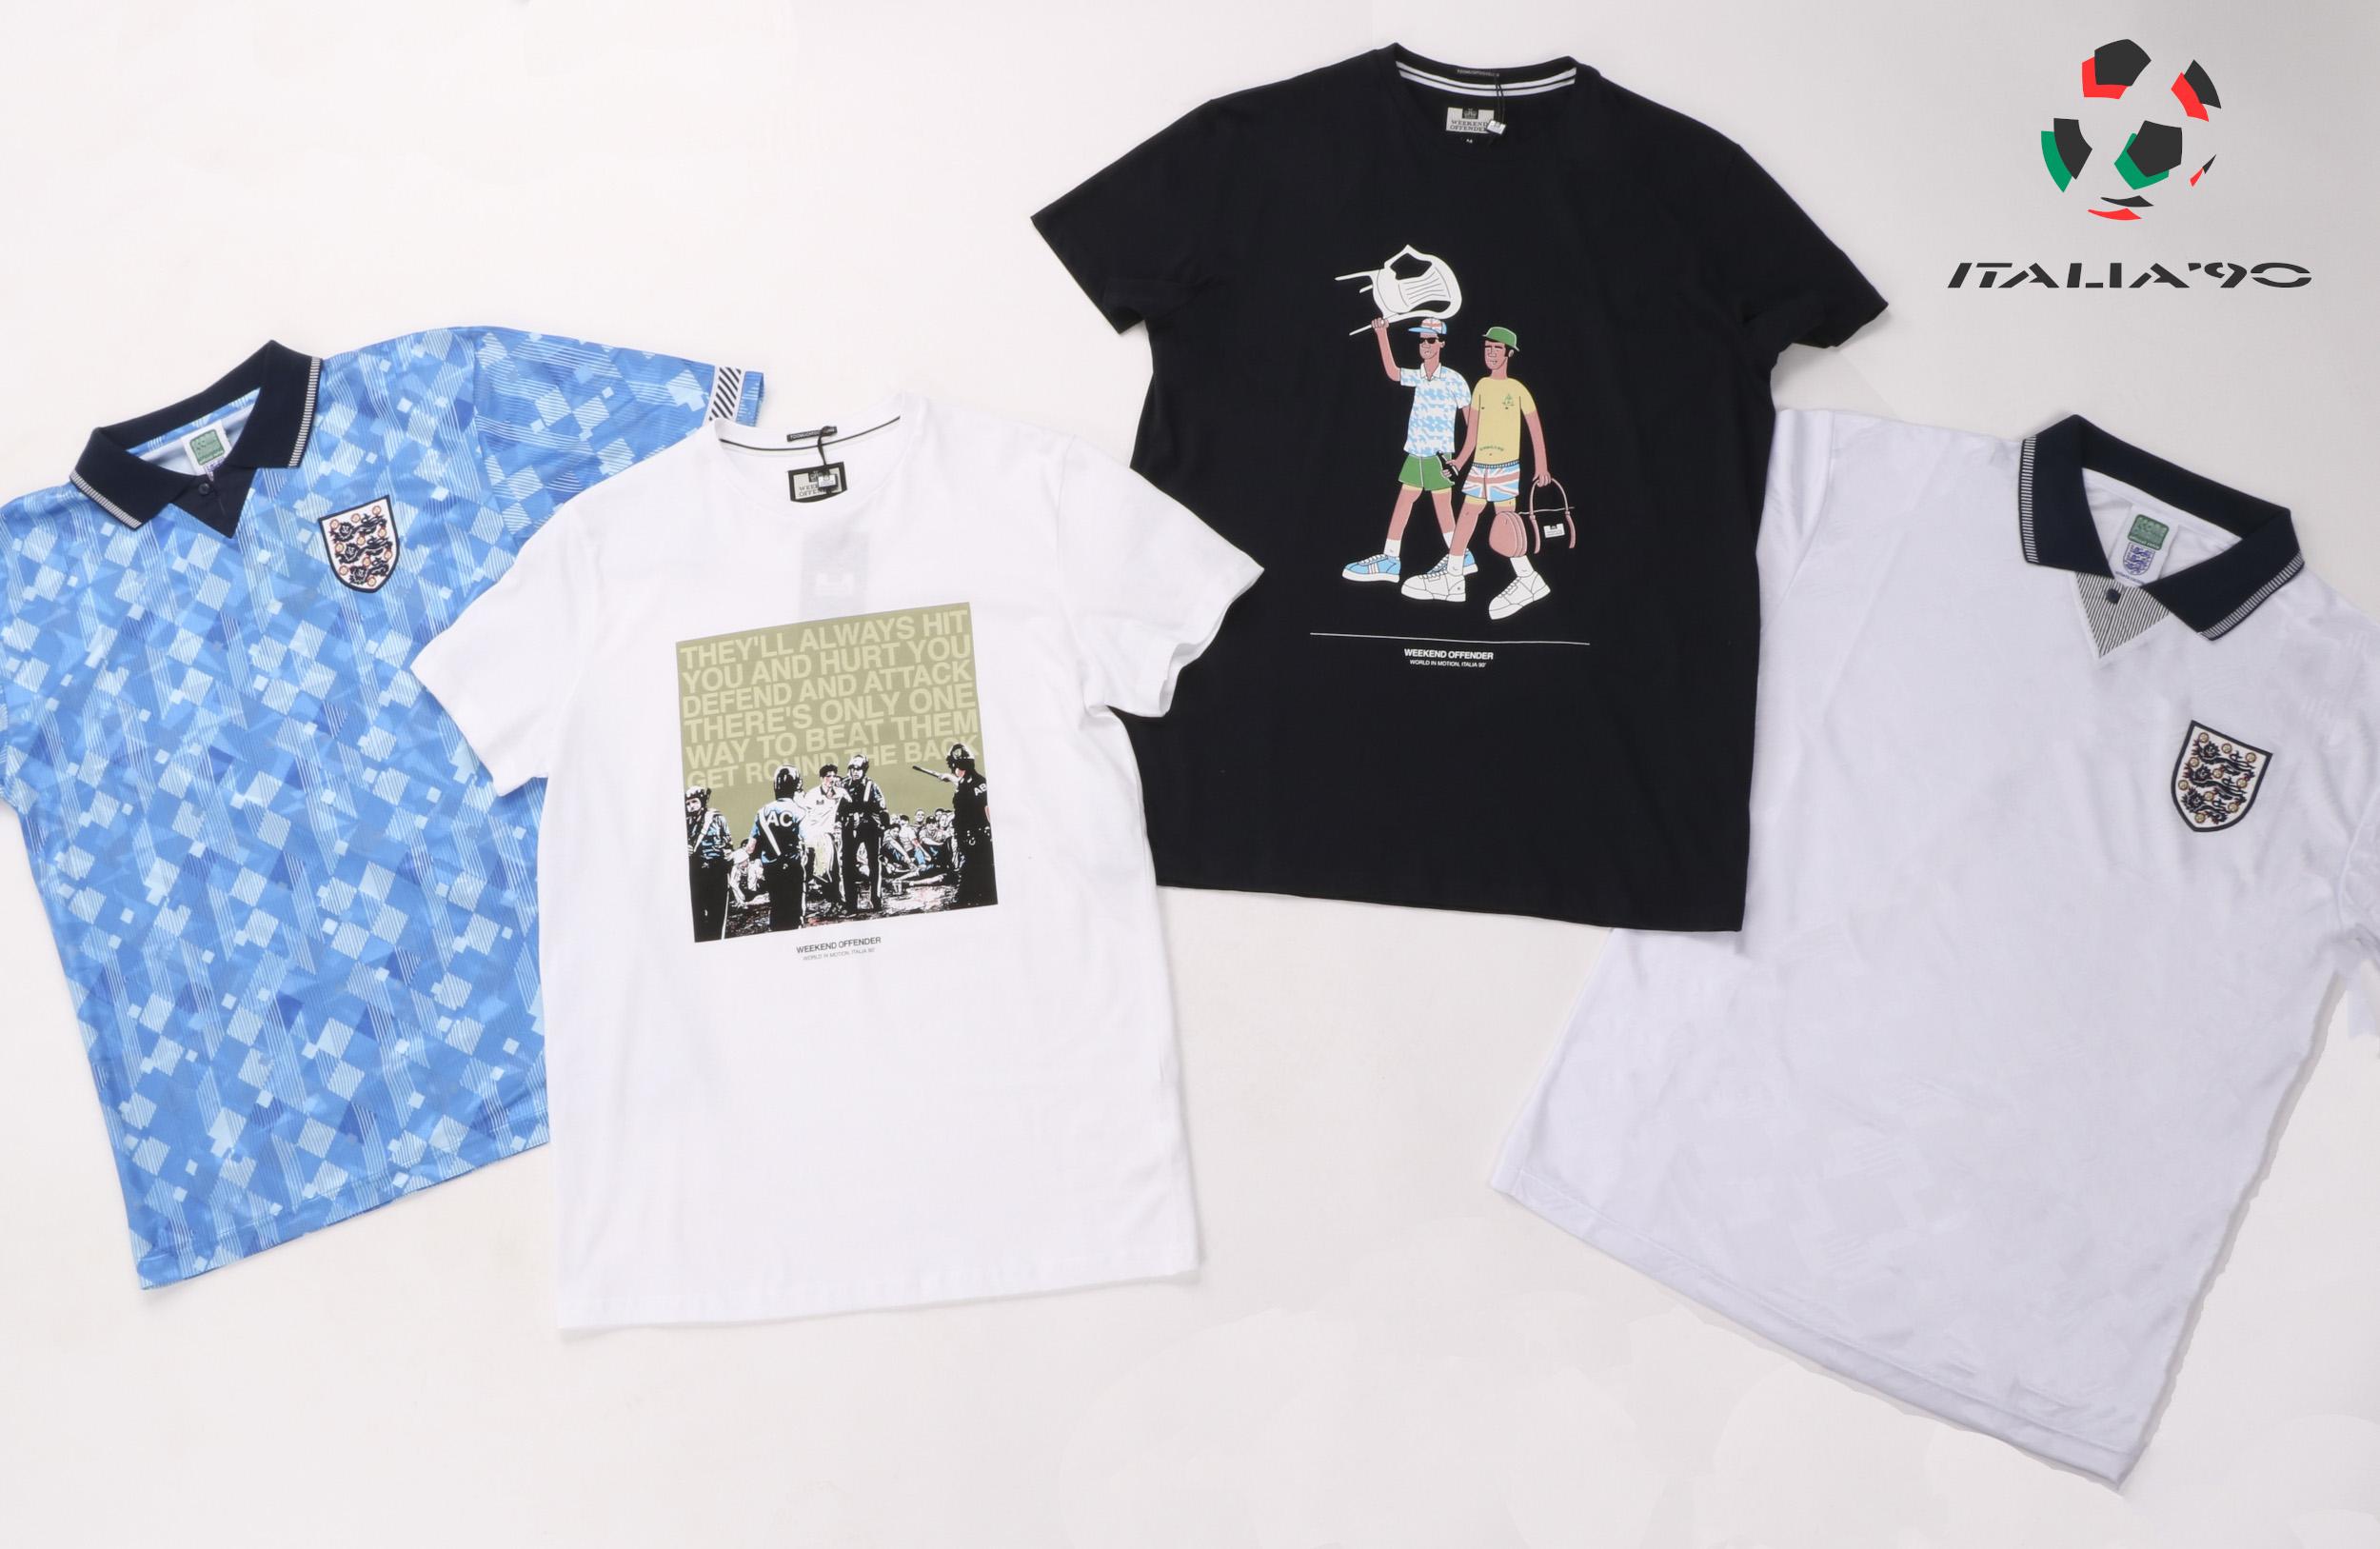 Italia 90 shirts